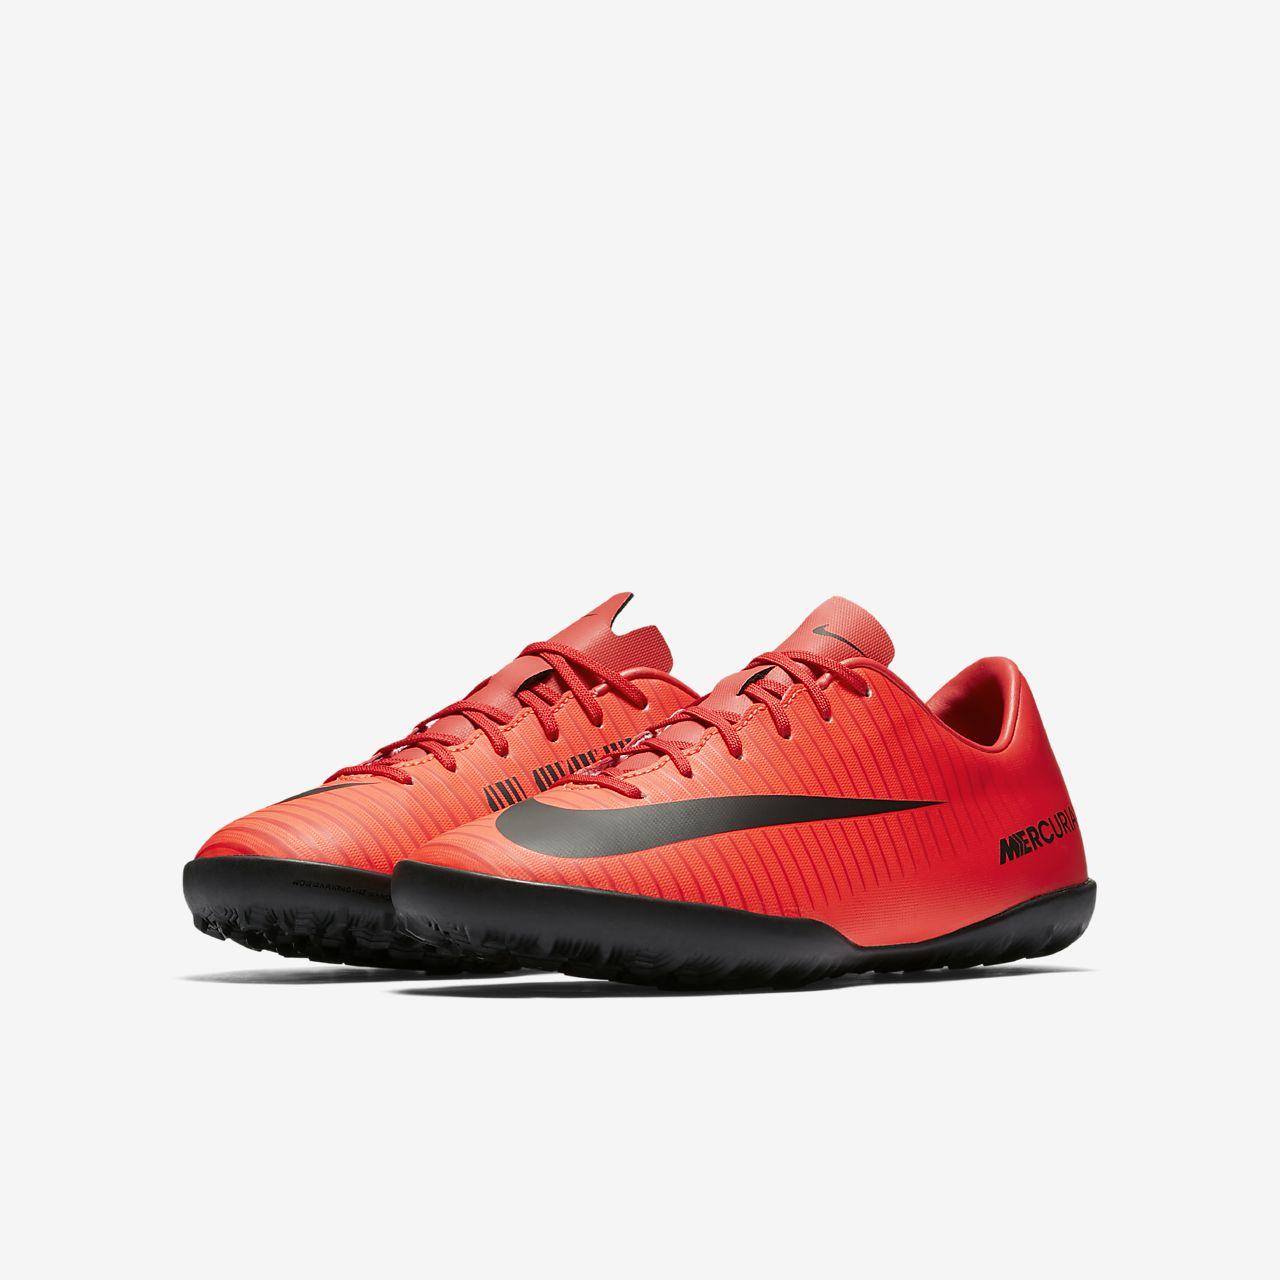 ... Nike Jr. Mercurial Victory VI Younger/Older Kids' Turf Football Shoe